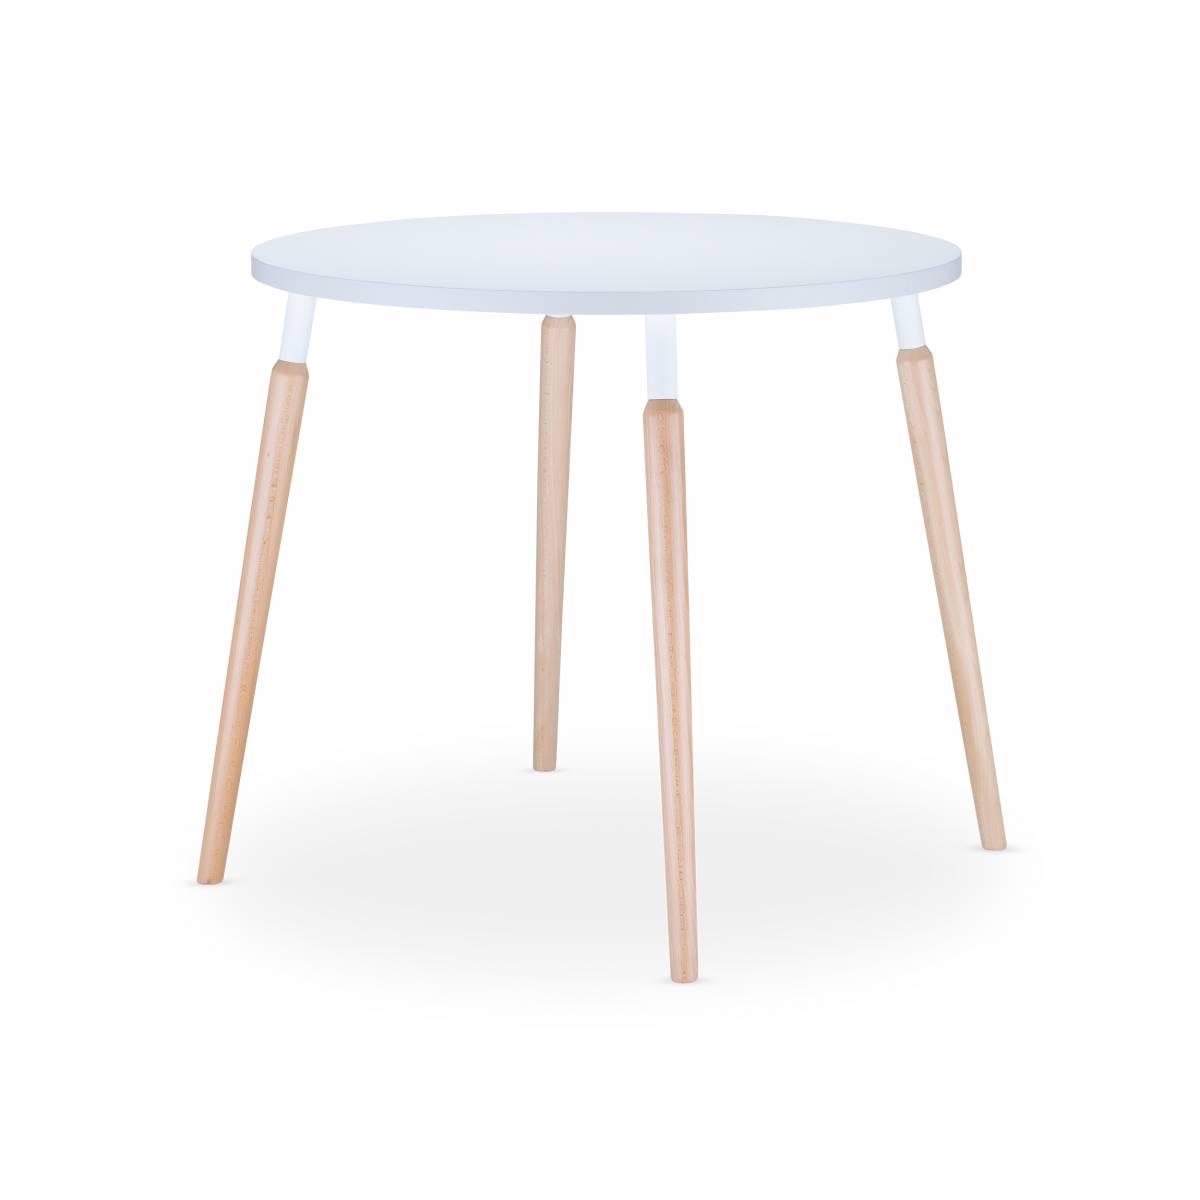 Table TAUKO taille standard diamètre 800